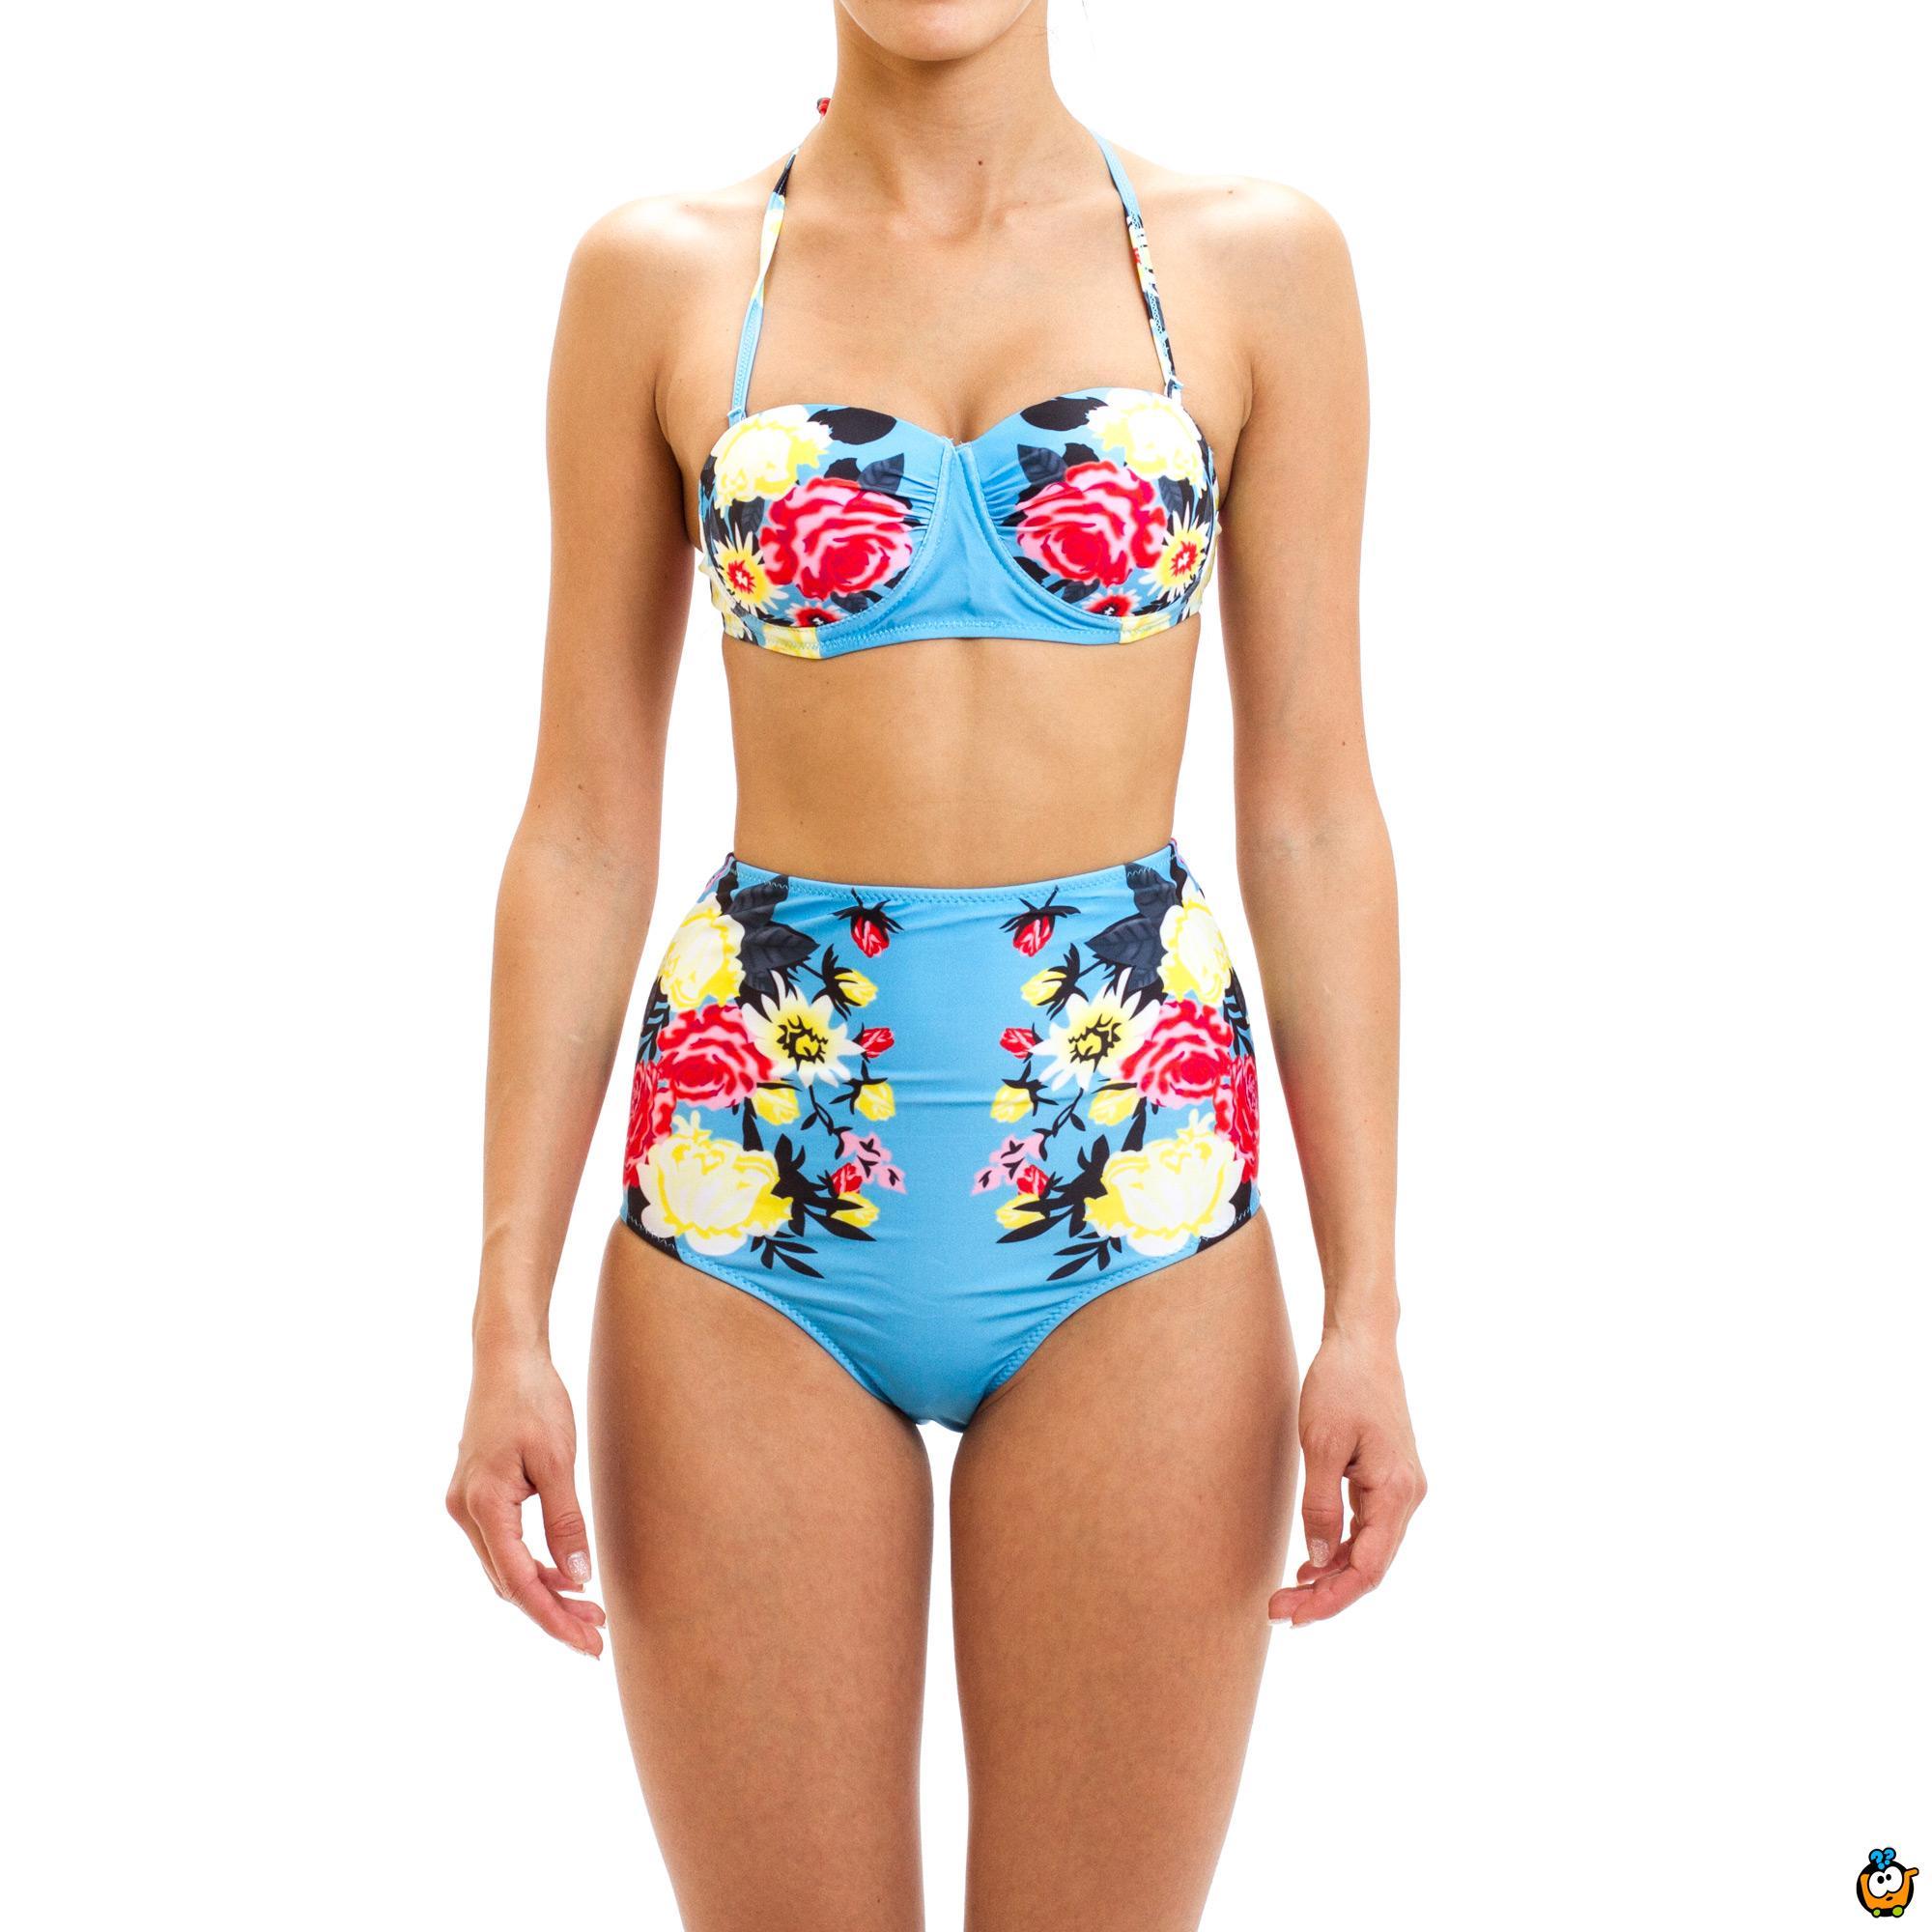 Dvodelni ženski kupaći kostim - RETRO  FLOW LAKE BLUE